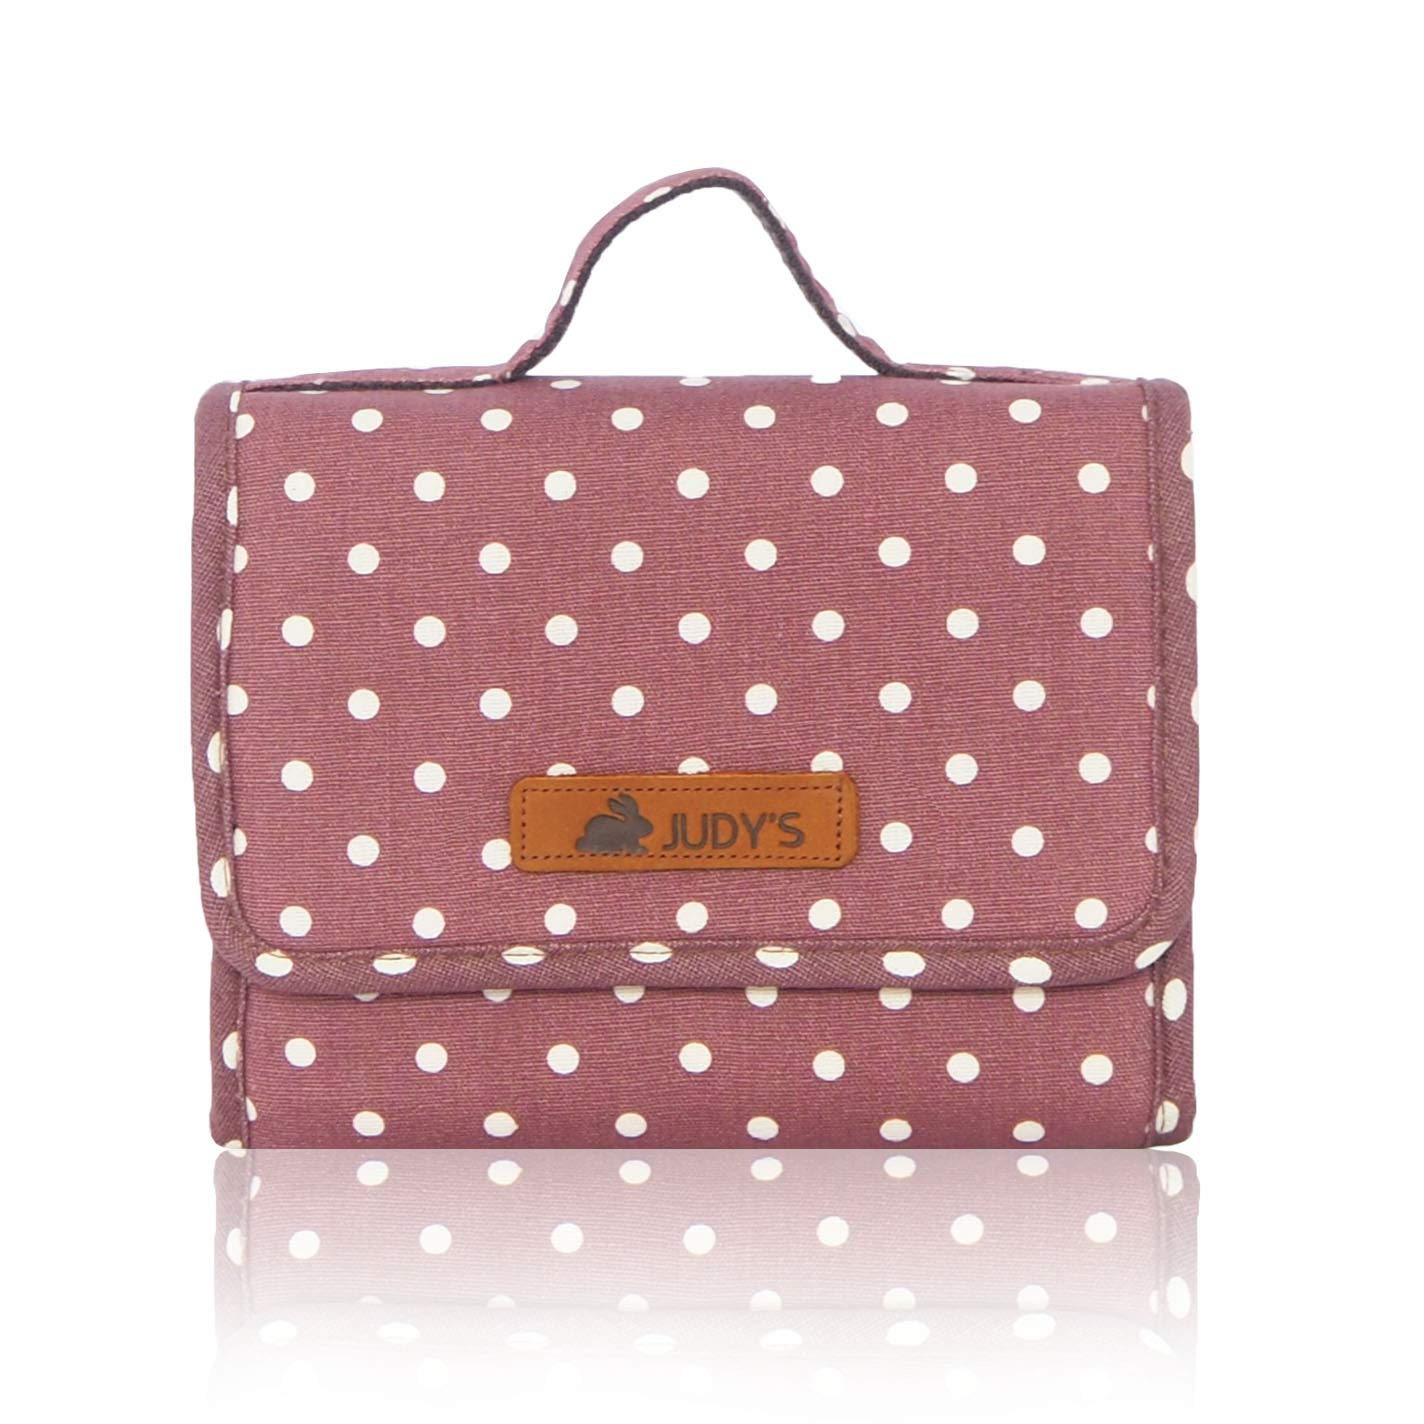 21fe7d74b3e4 Amazon.com: Judys Women Designer Thailand Handbags and Purses Ladies ...